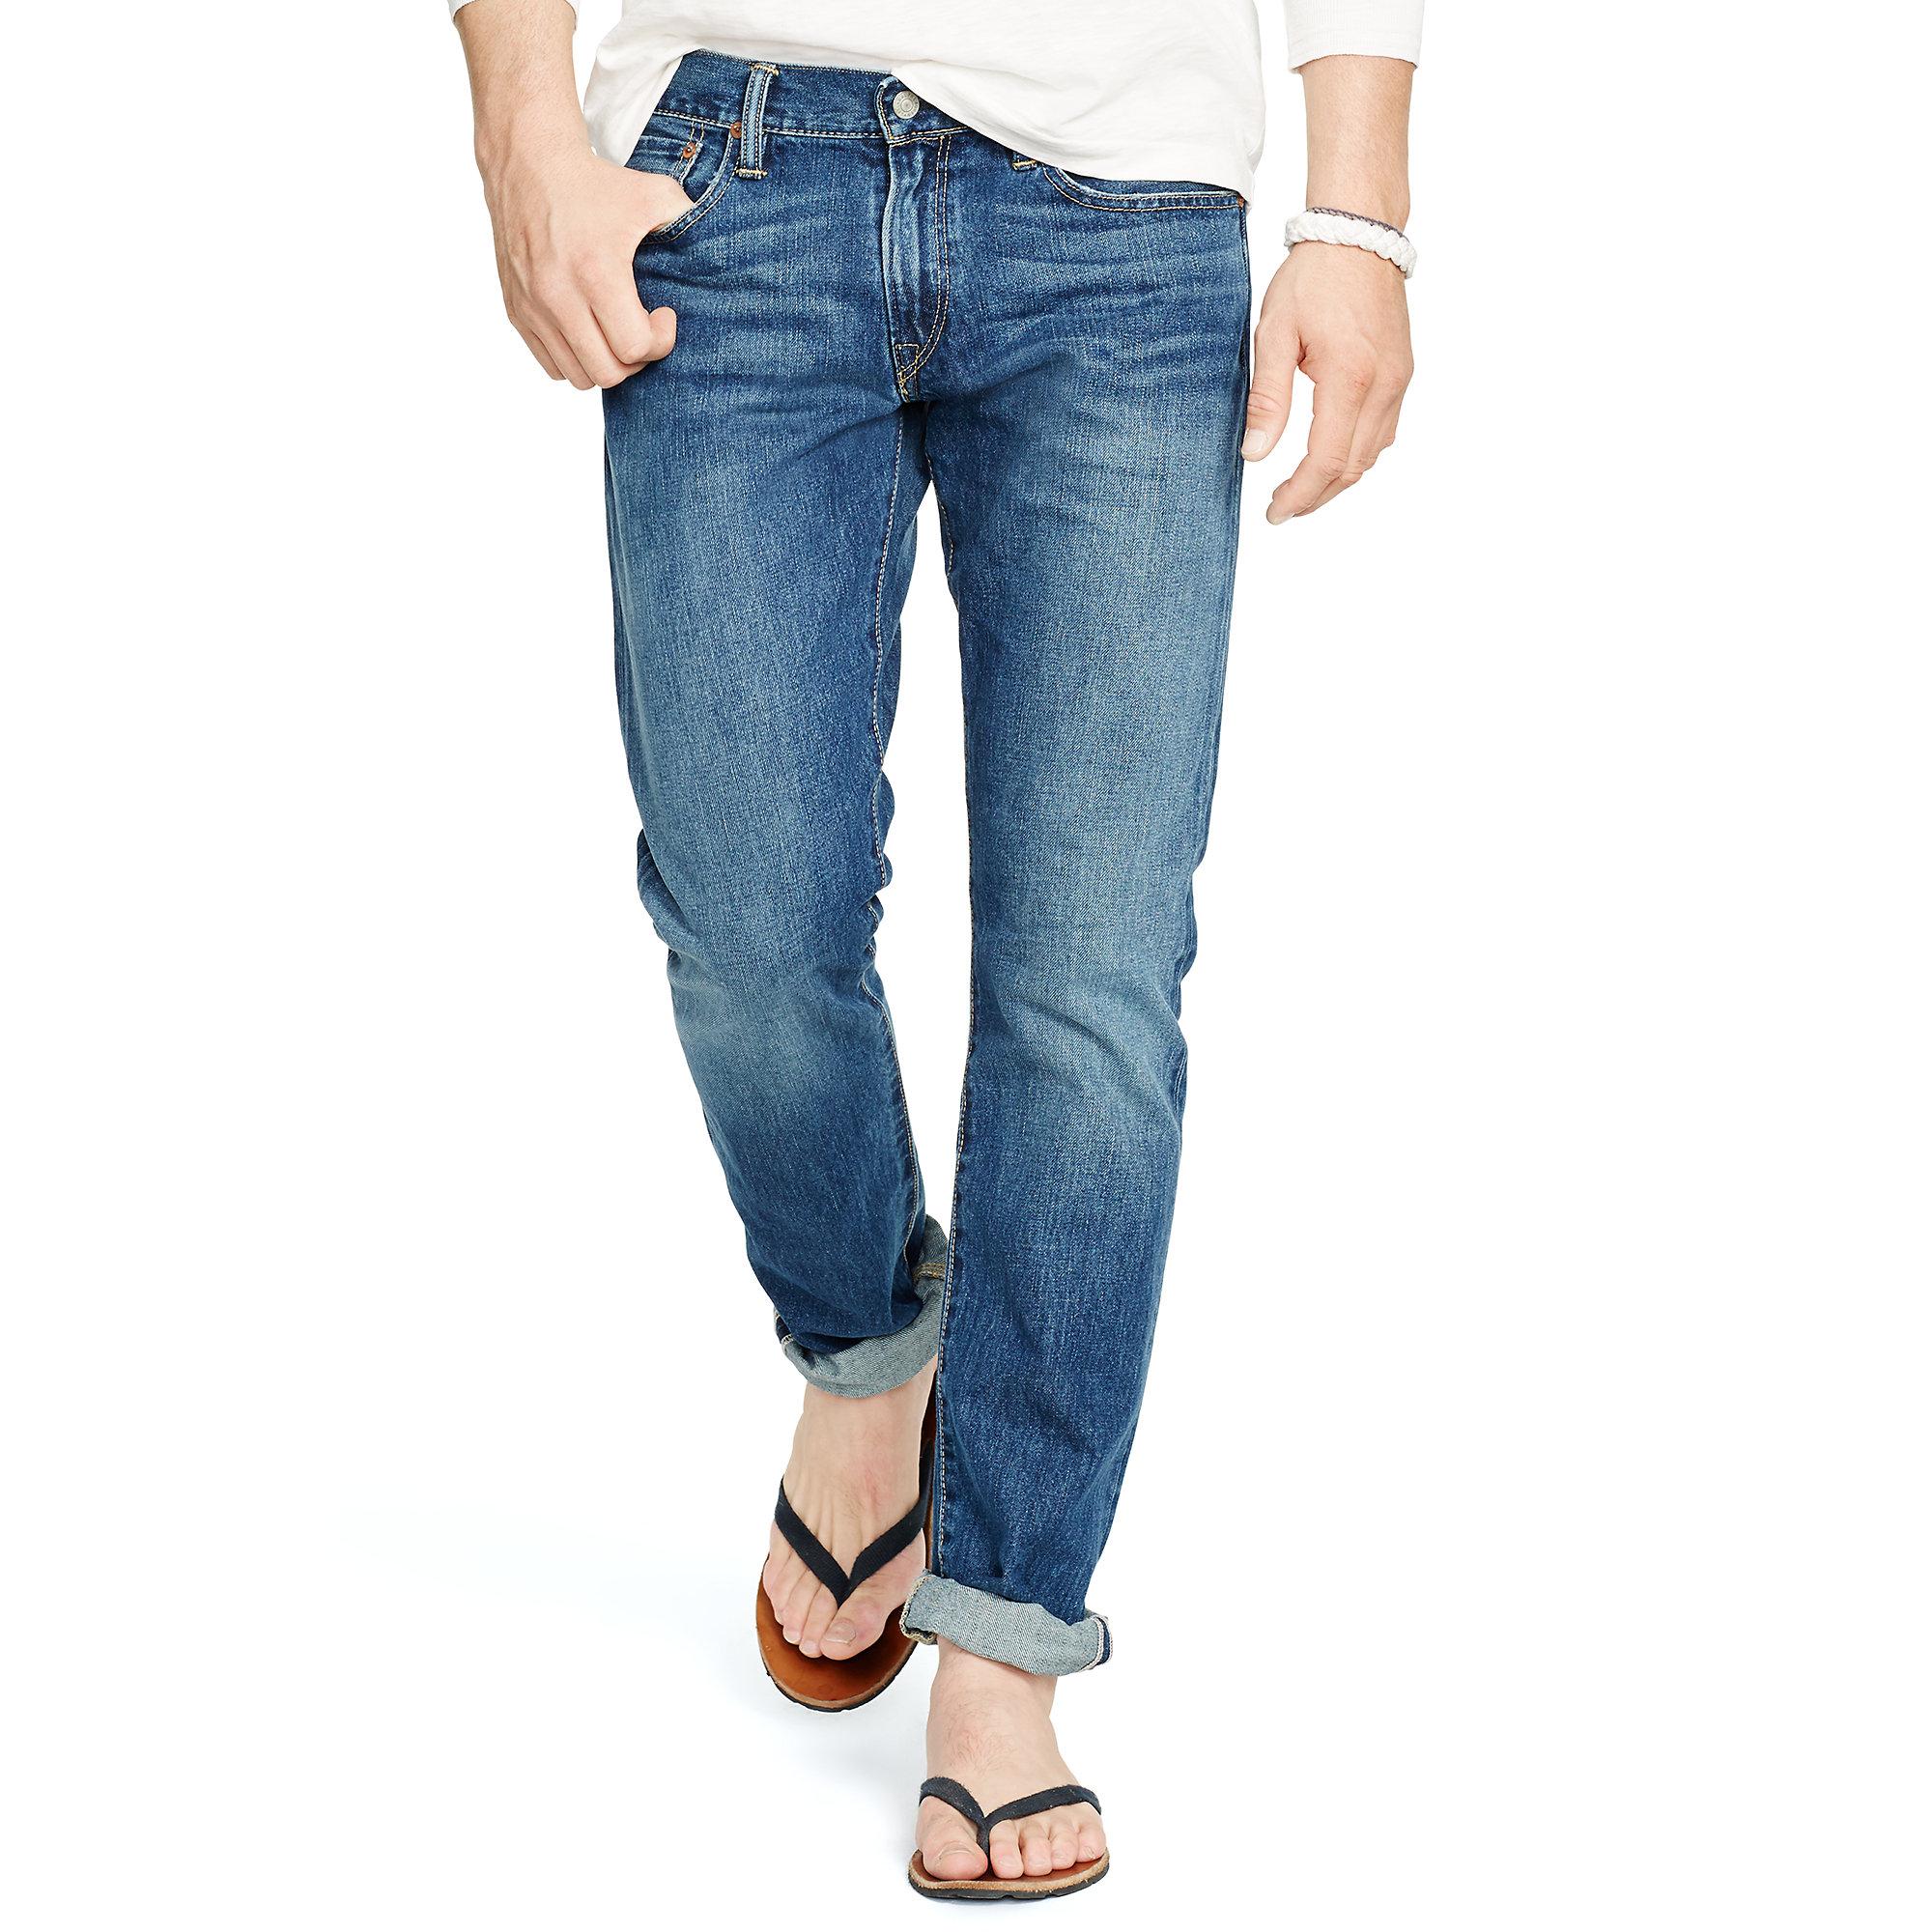 polo ralph lauren sullivan slim fit jean in blue for men. Black Bedroom Furniture Sets. Home Design Ideas